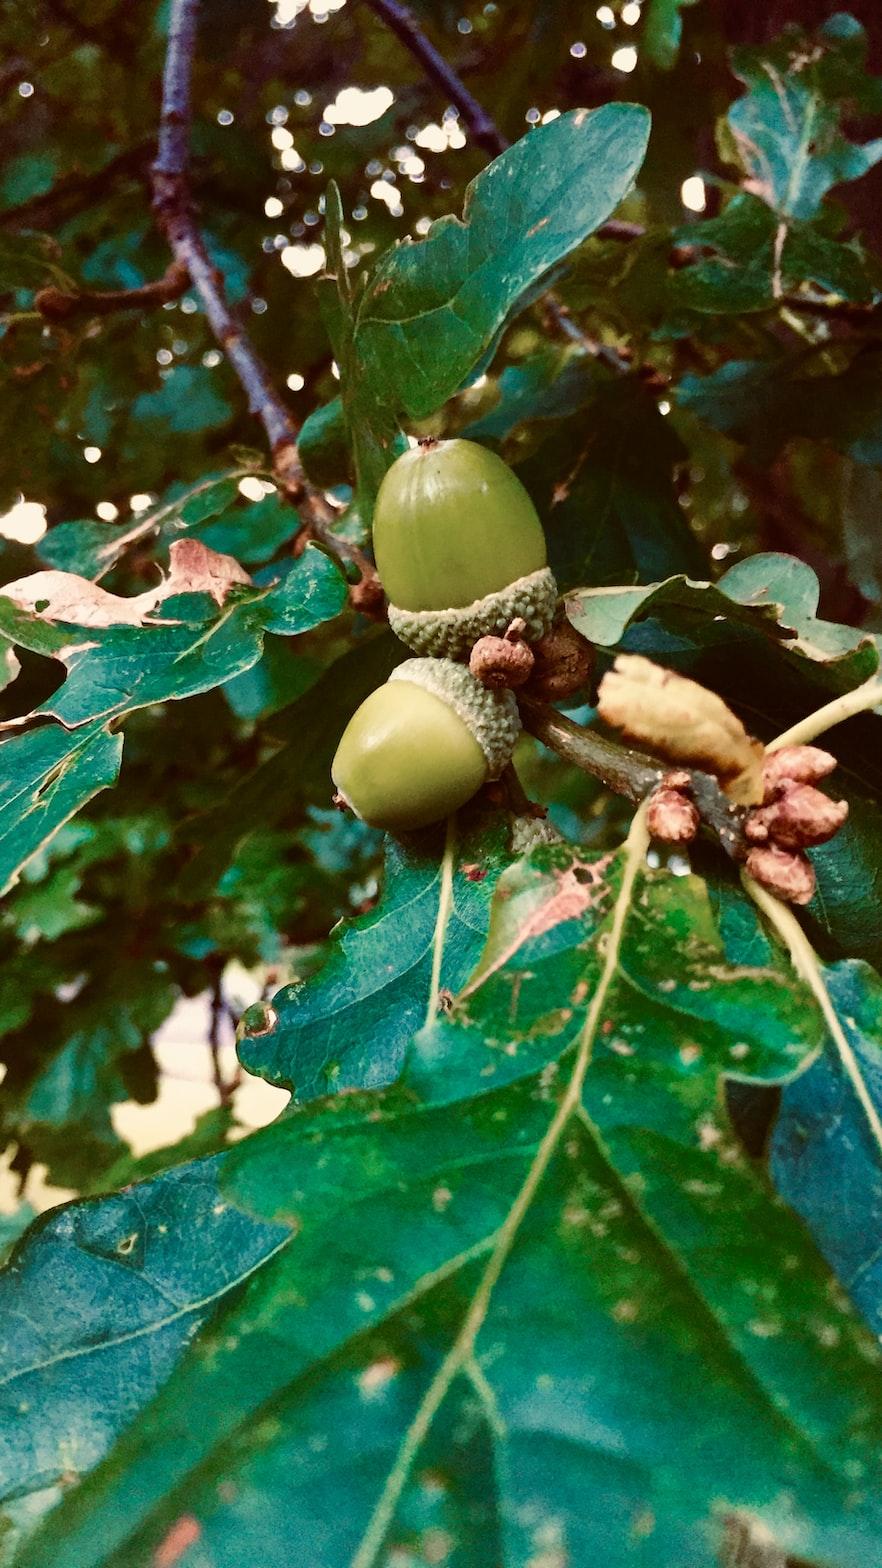 Acorns still on an oak tree